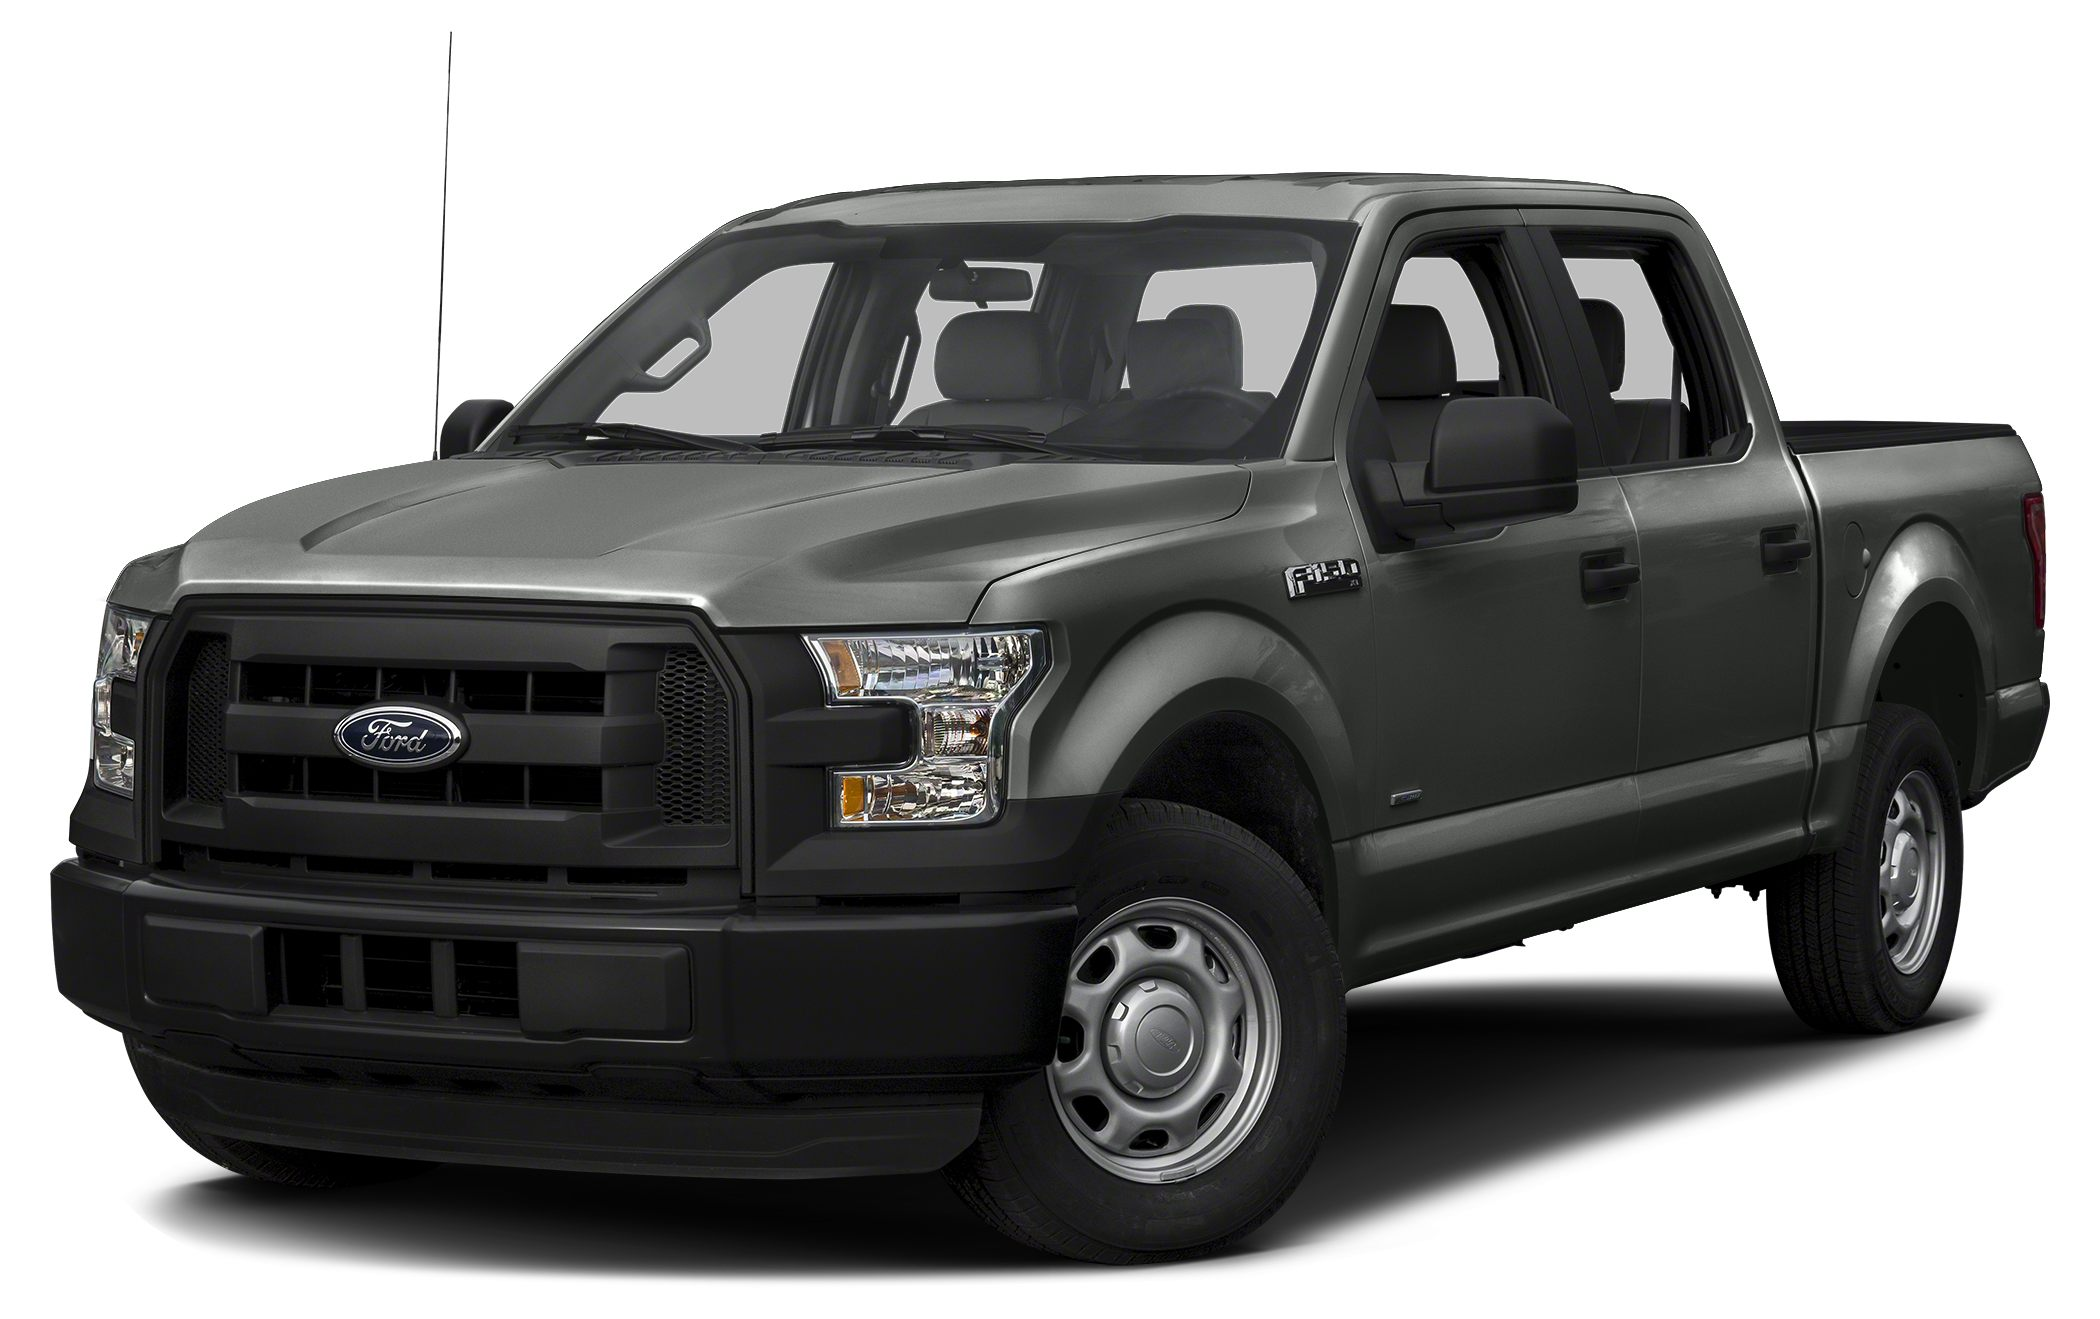 2017 Ford F-150  Price includes 300 - EcoBoost Bonus Cash Exp 04032017 500 - Ford Credit R